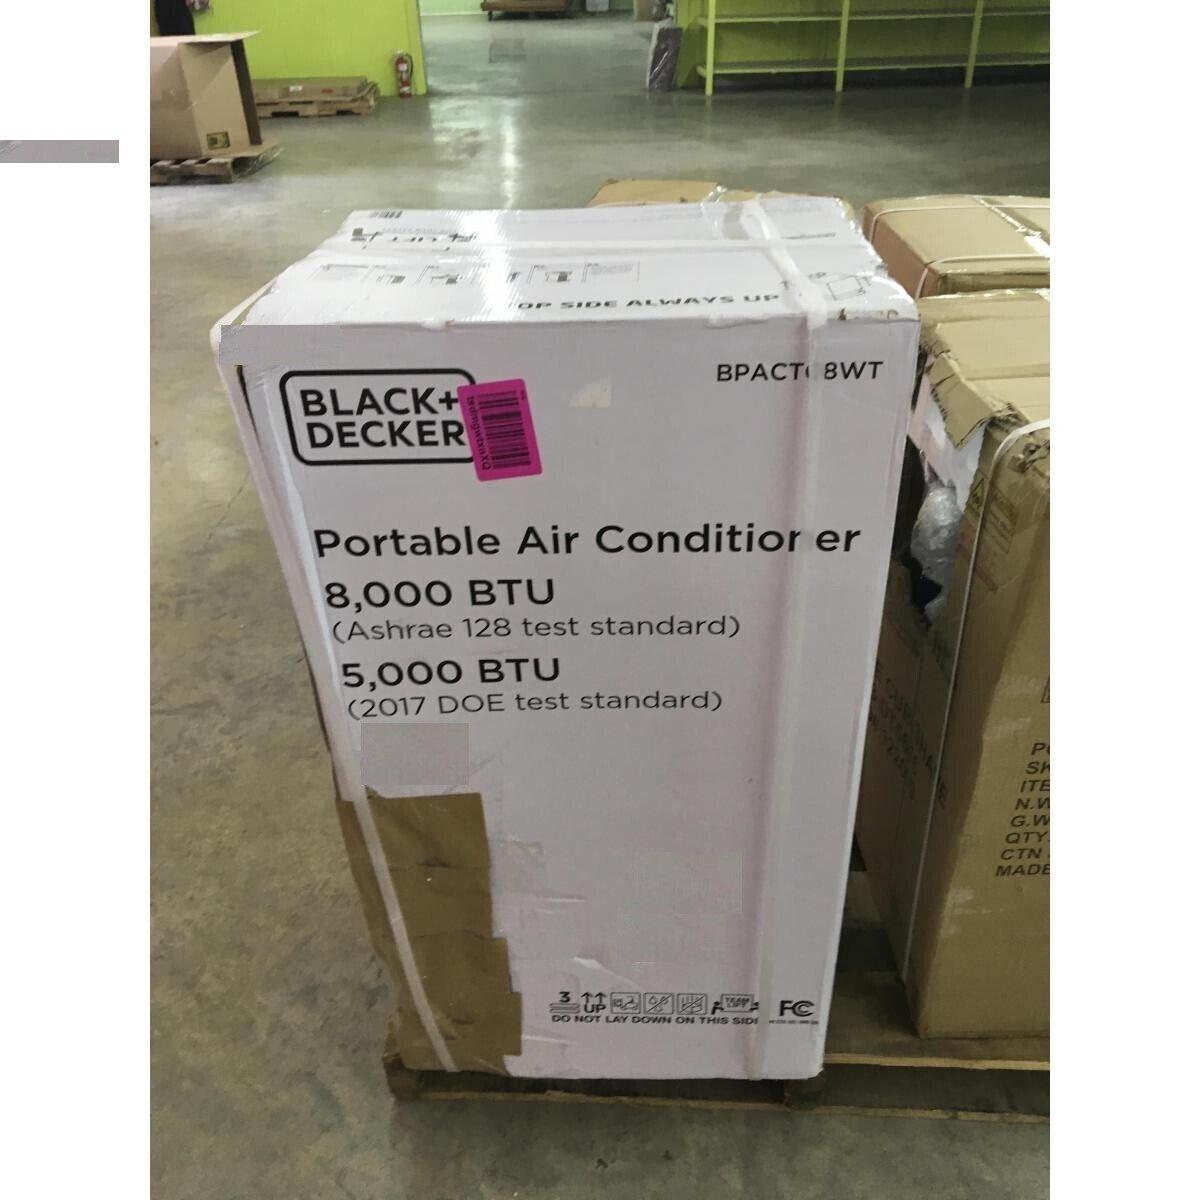 black decker bpact08wt portable air conditioner ac